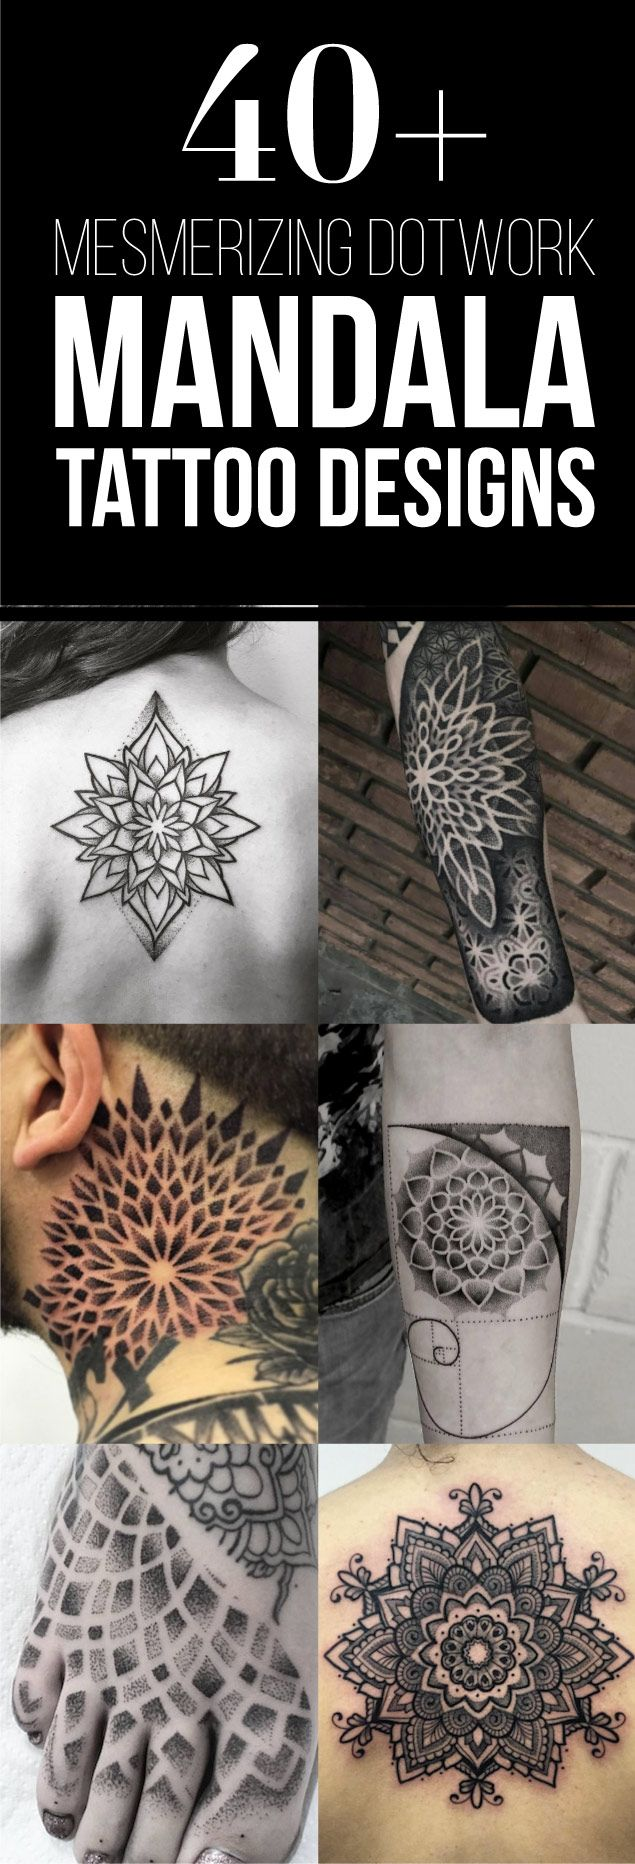 40+ Mesmerizing Dotwork Mandala Tattoo Designs | TattooBlend